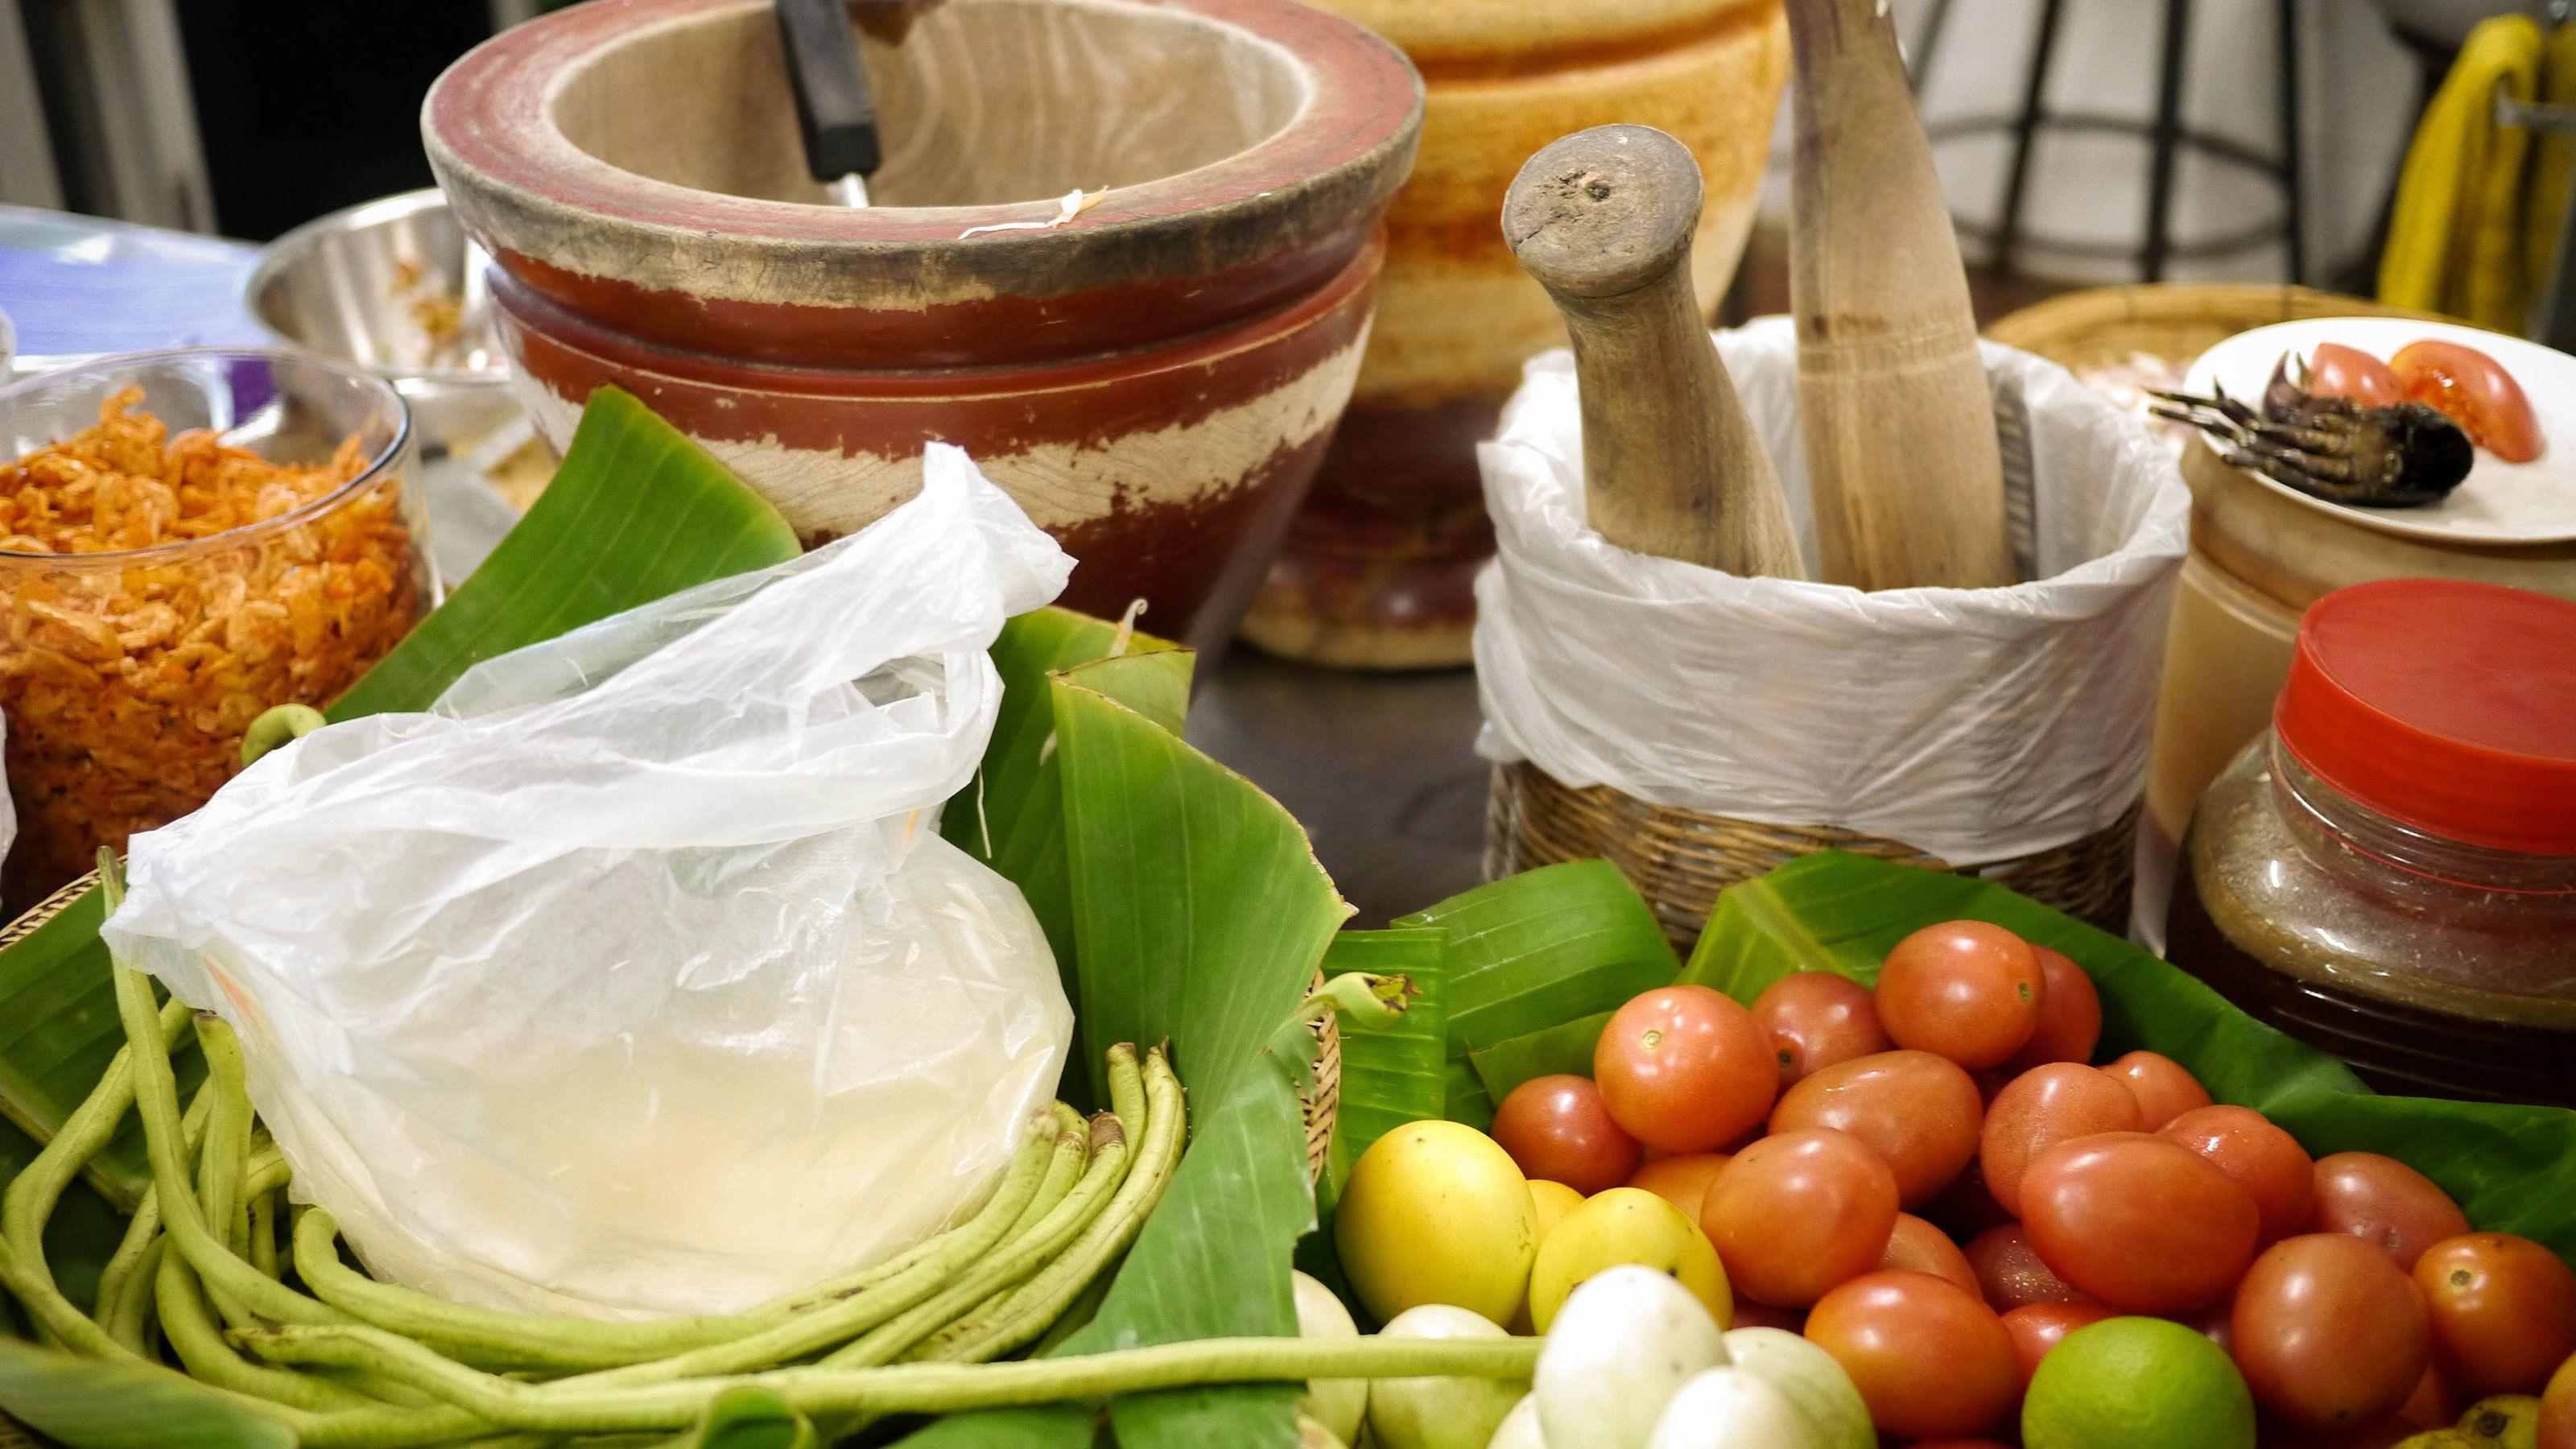 Cooking ingredients at the market in Bangkok